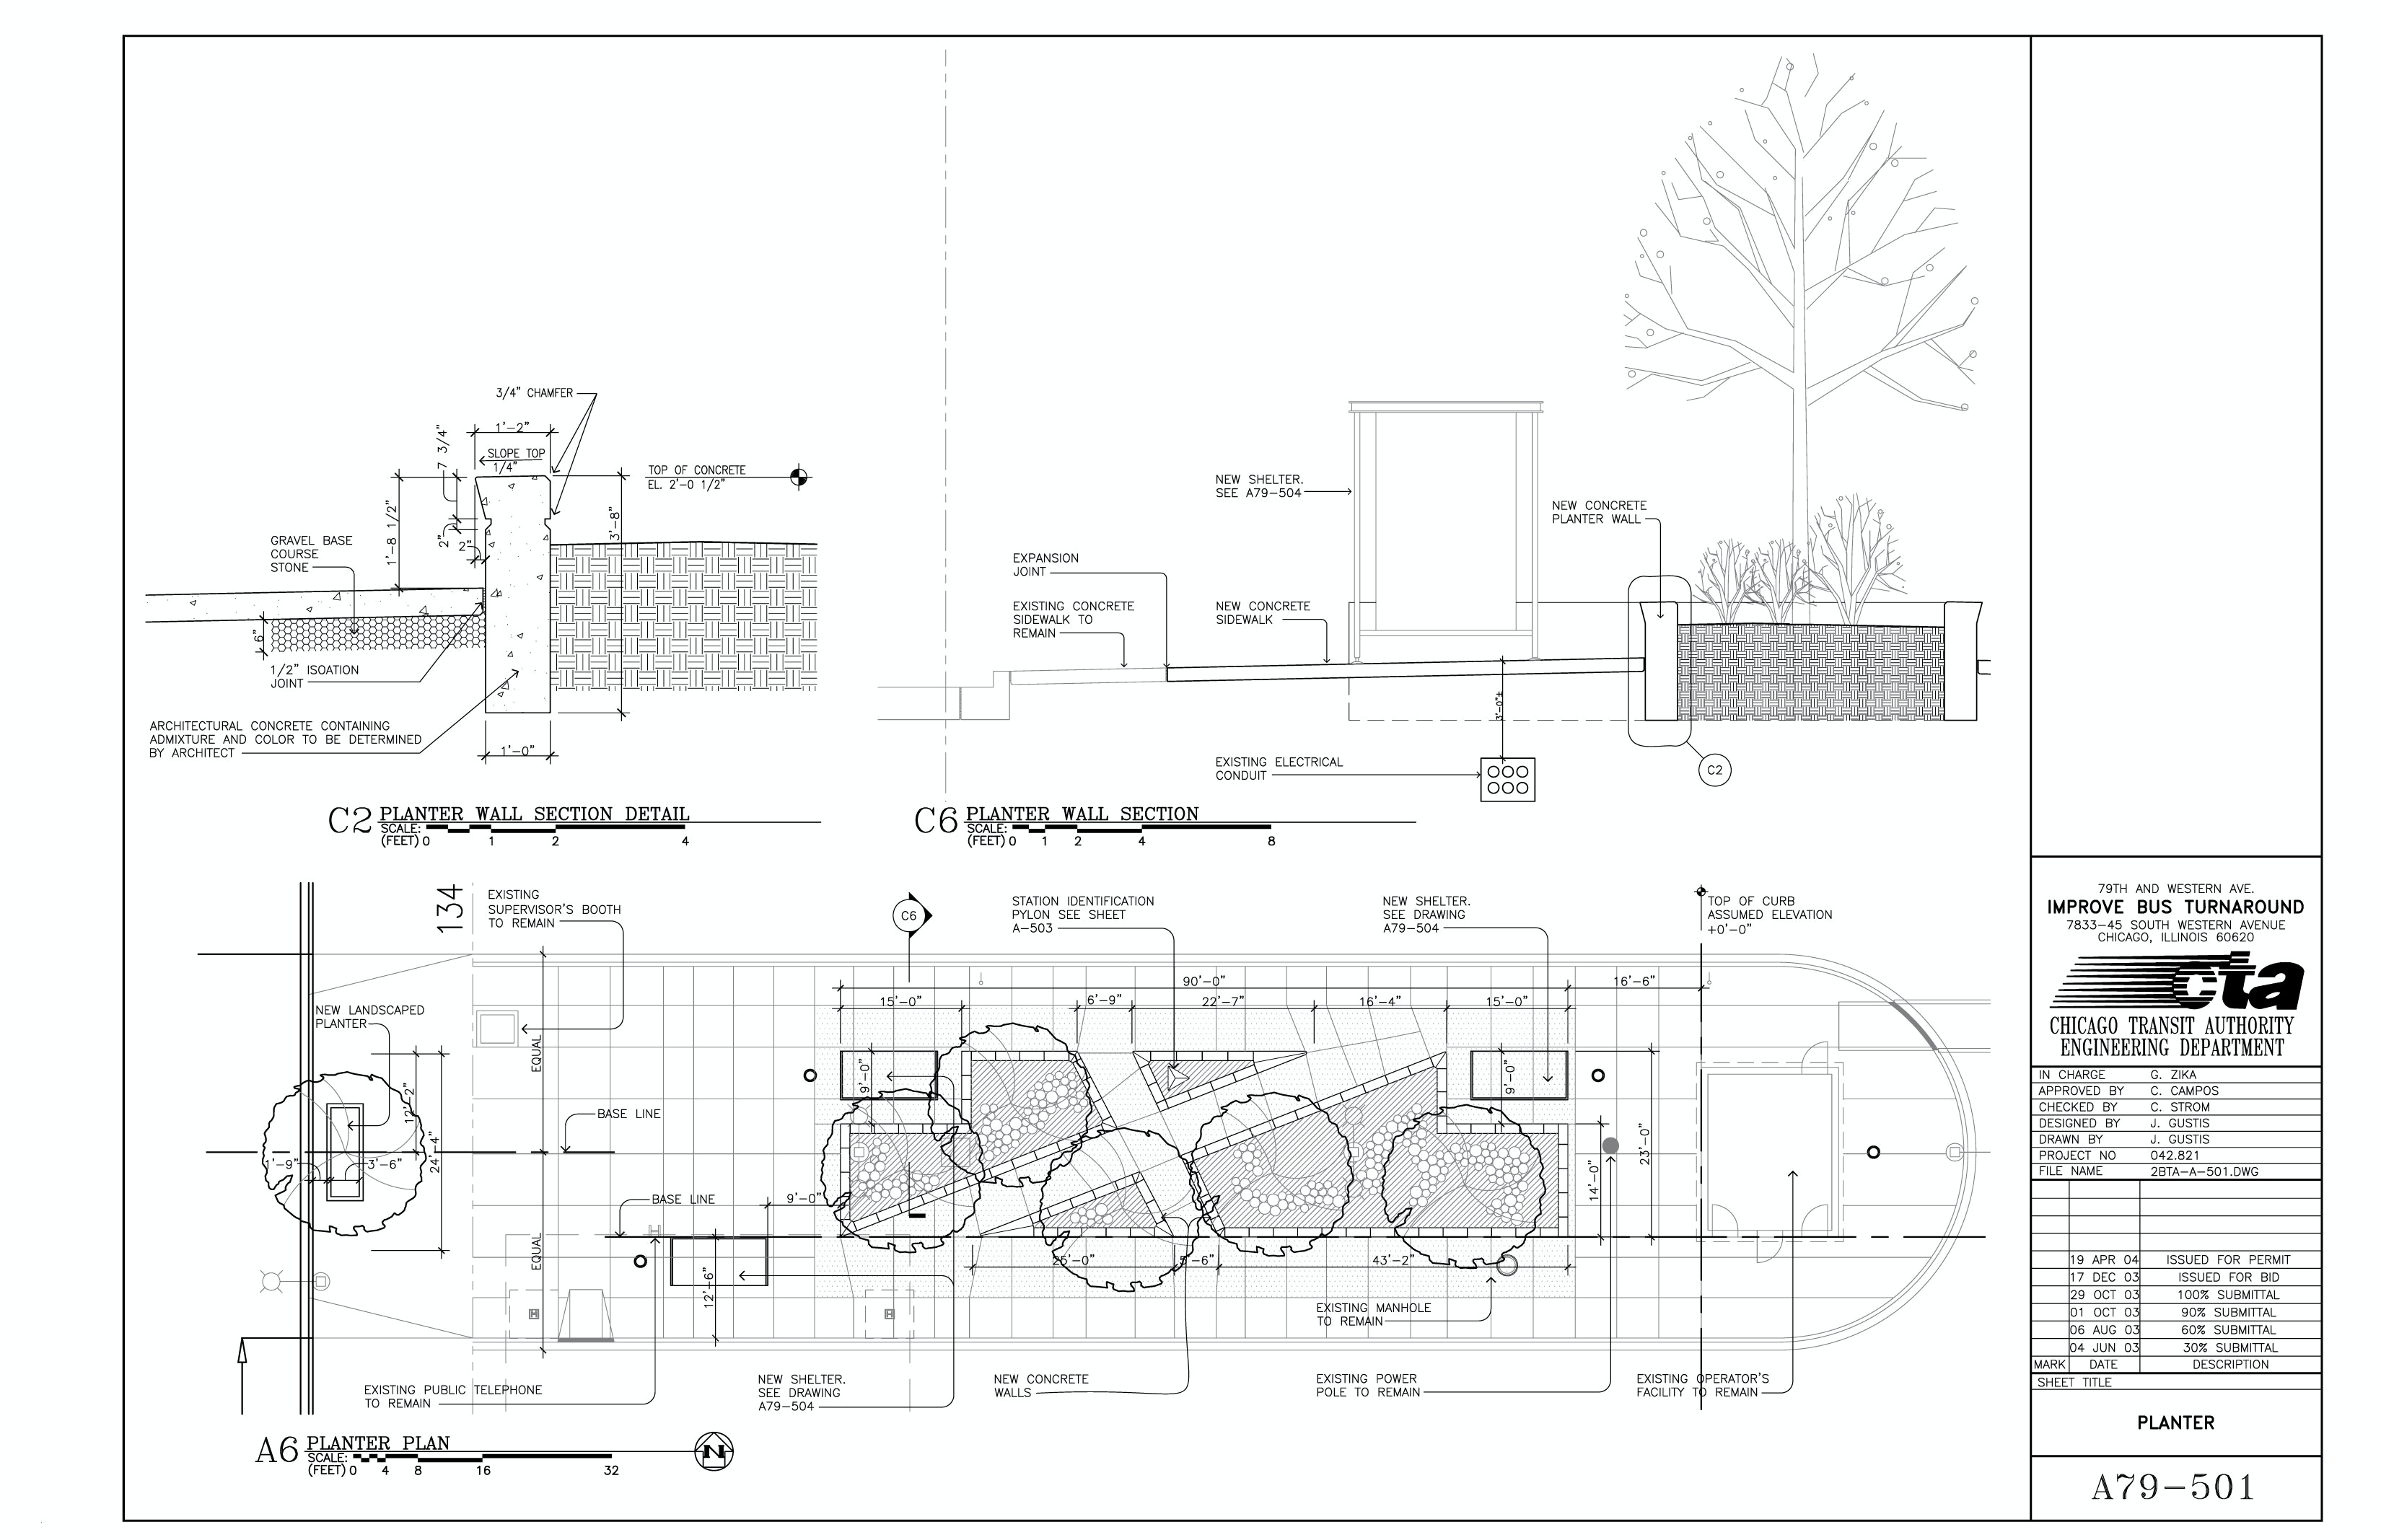 56tqp1h5yk31c2up?auto\=compress%2Cformat 795h wiring diagram chevy wiring schematics \u2022 wiring diagrams j 3m opticom wiring diagram at eliteediting.co